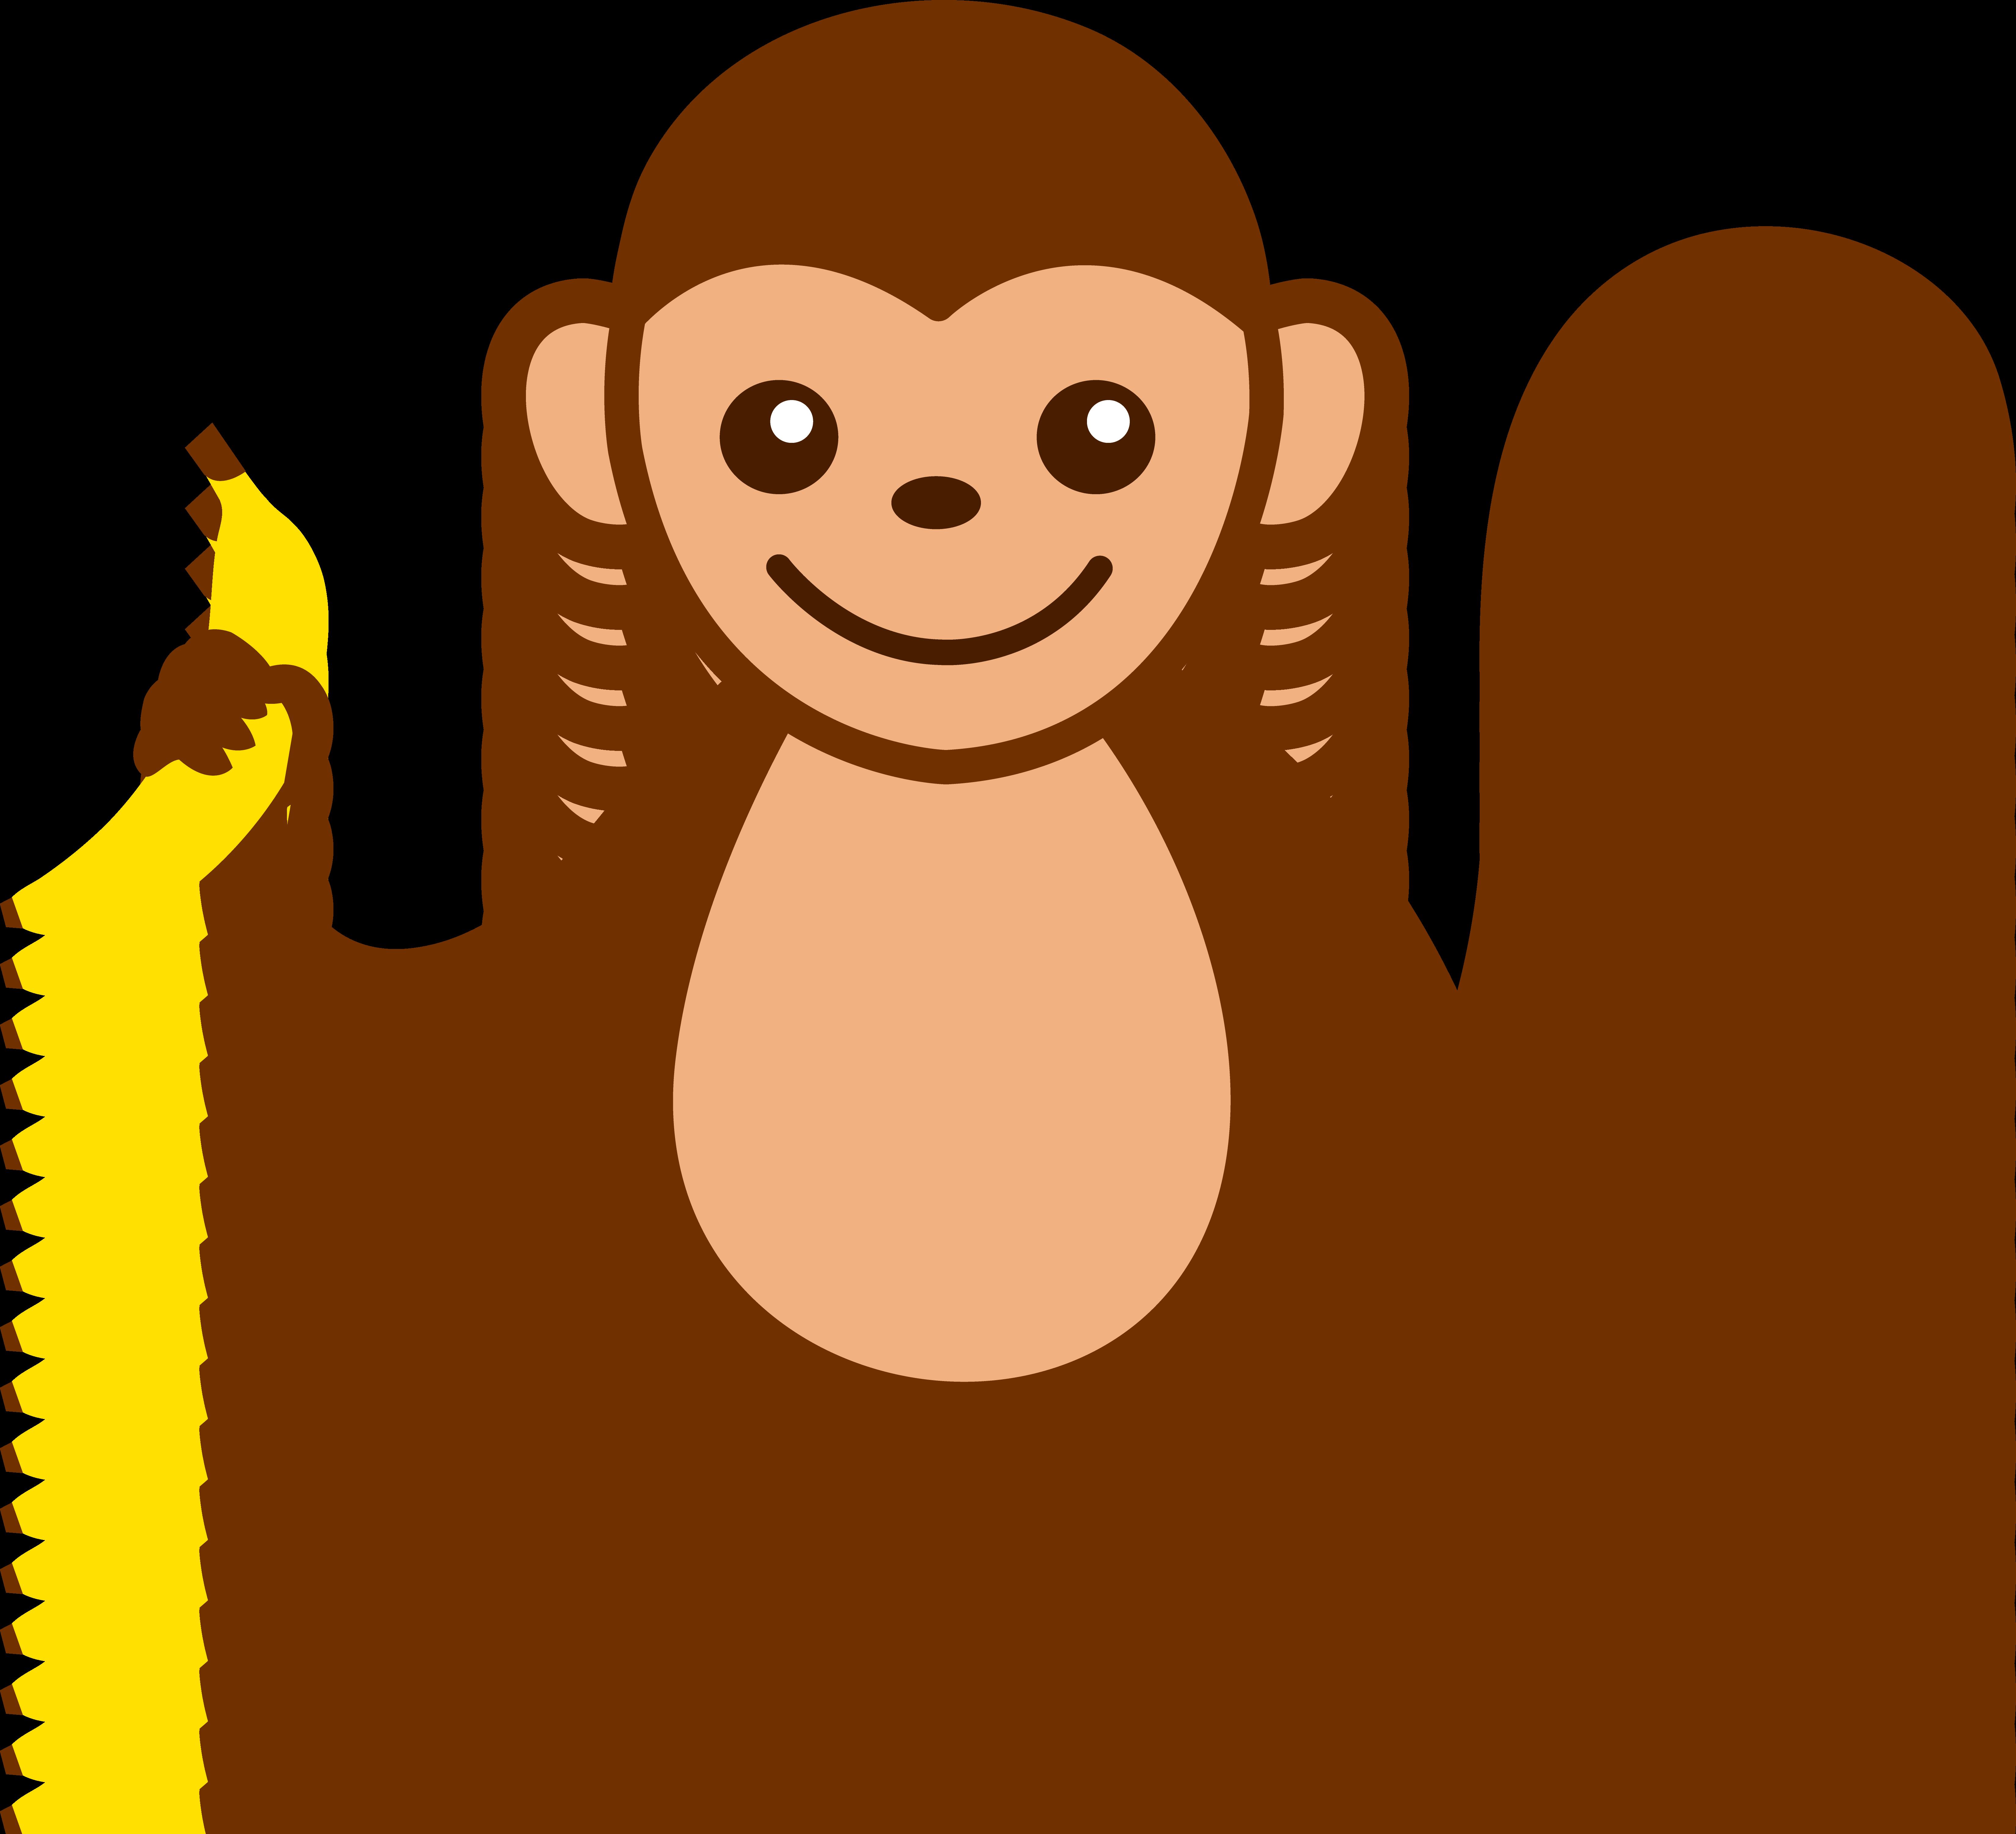 Baby boy monkey clipart jpg royalty free library Baby Boy Monkey Clip Art | Clipart Panda - Free Clipart Images jpg royalty free library